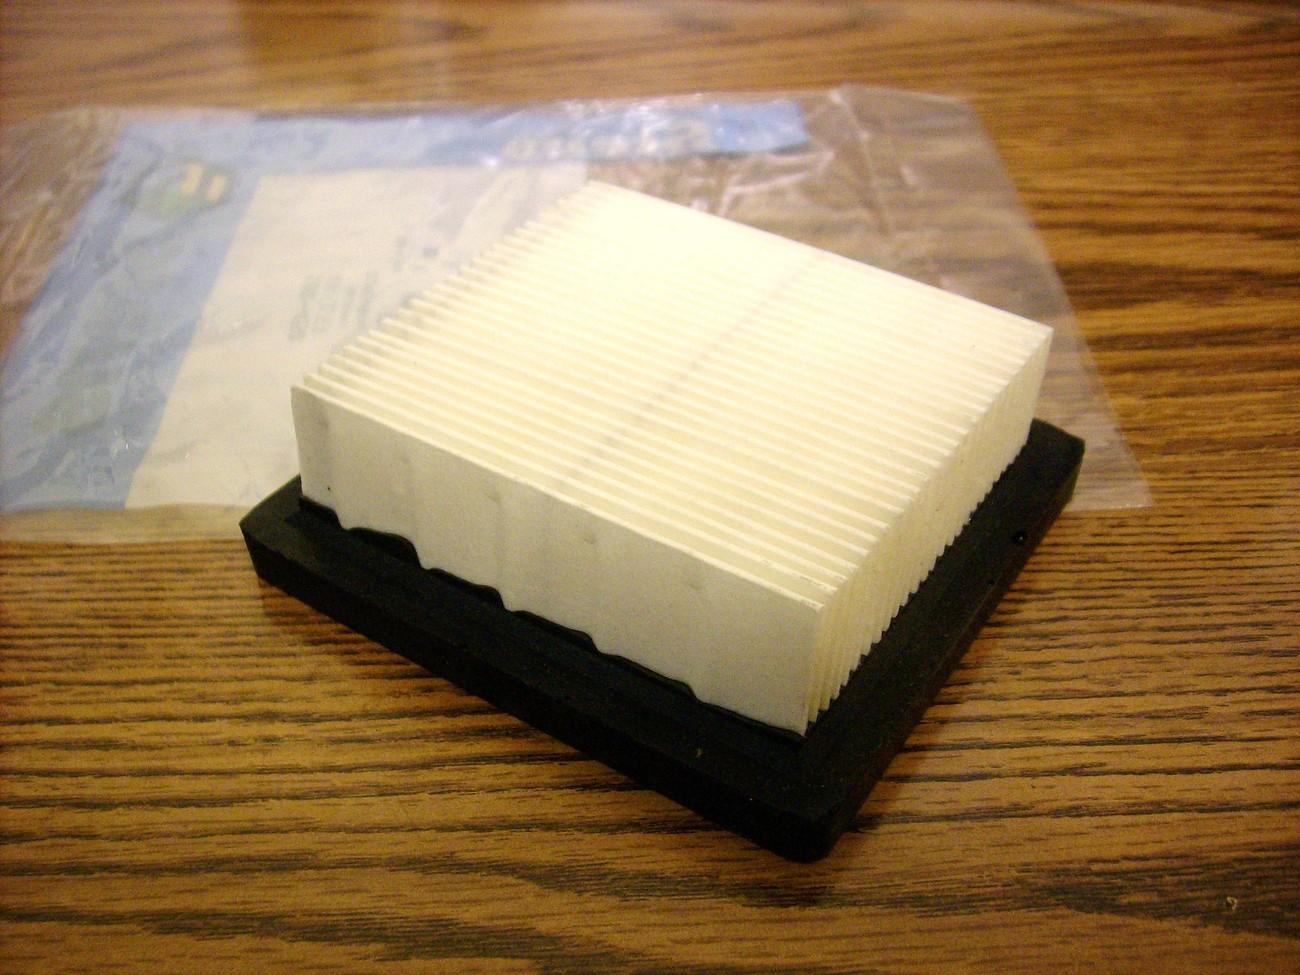 AYP, Craftsman air filter 36046, OEM-36046, 33325